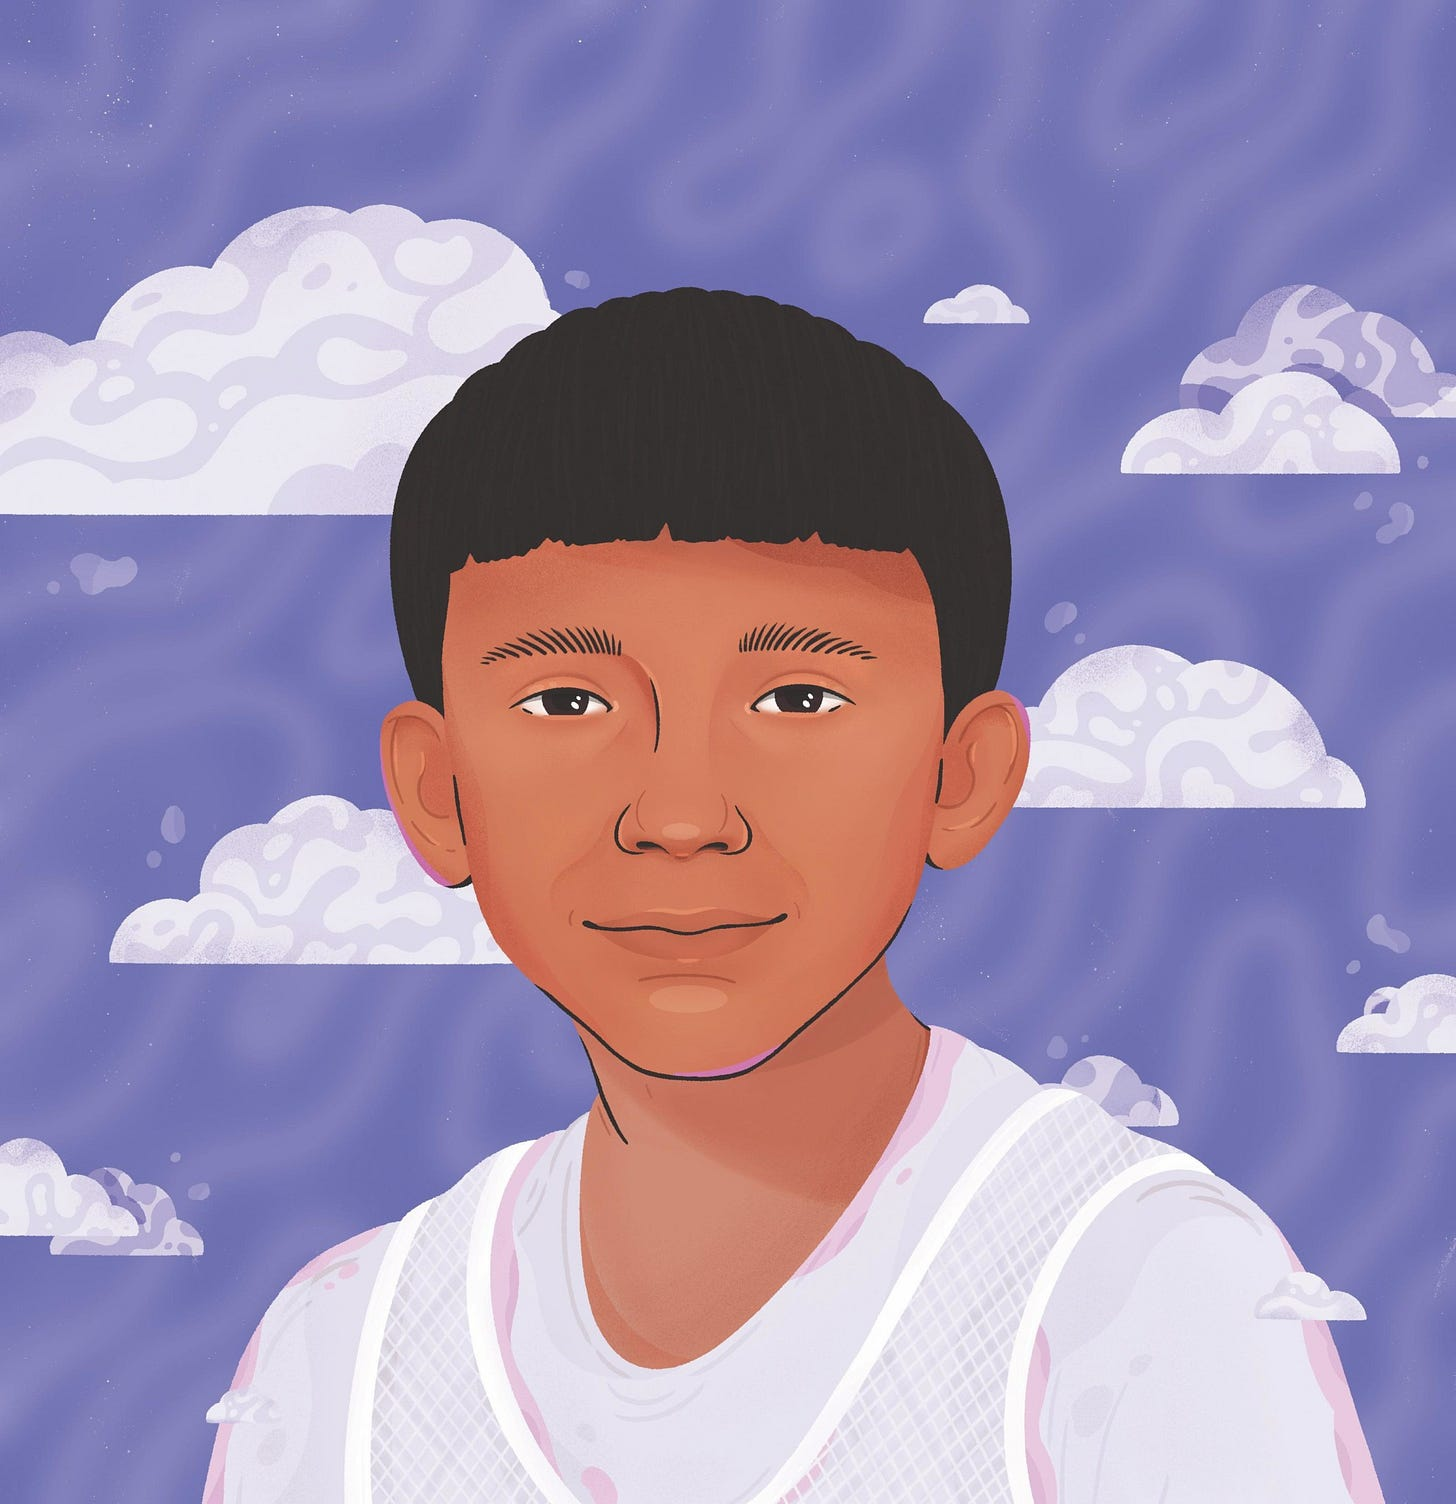 Adam Toledo. Illustration by Thumy Phan.